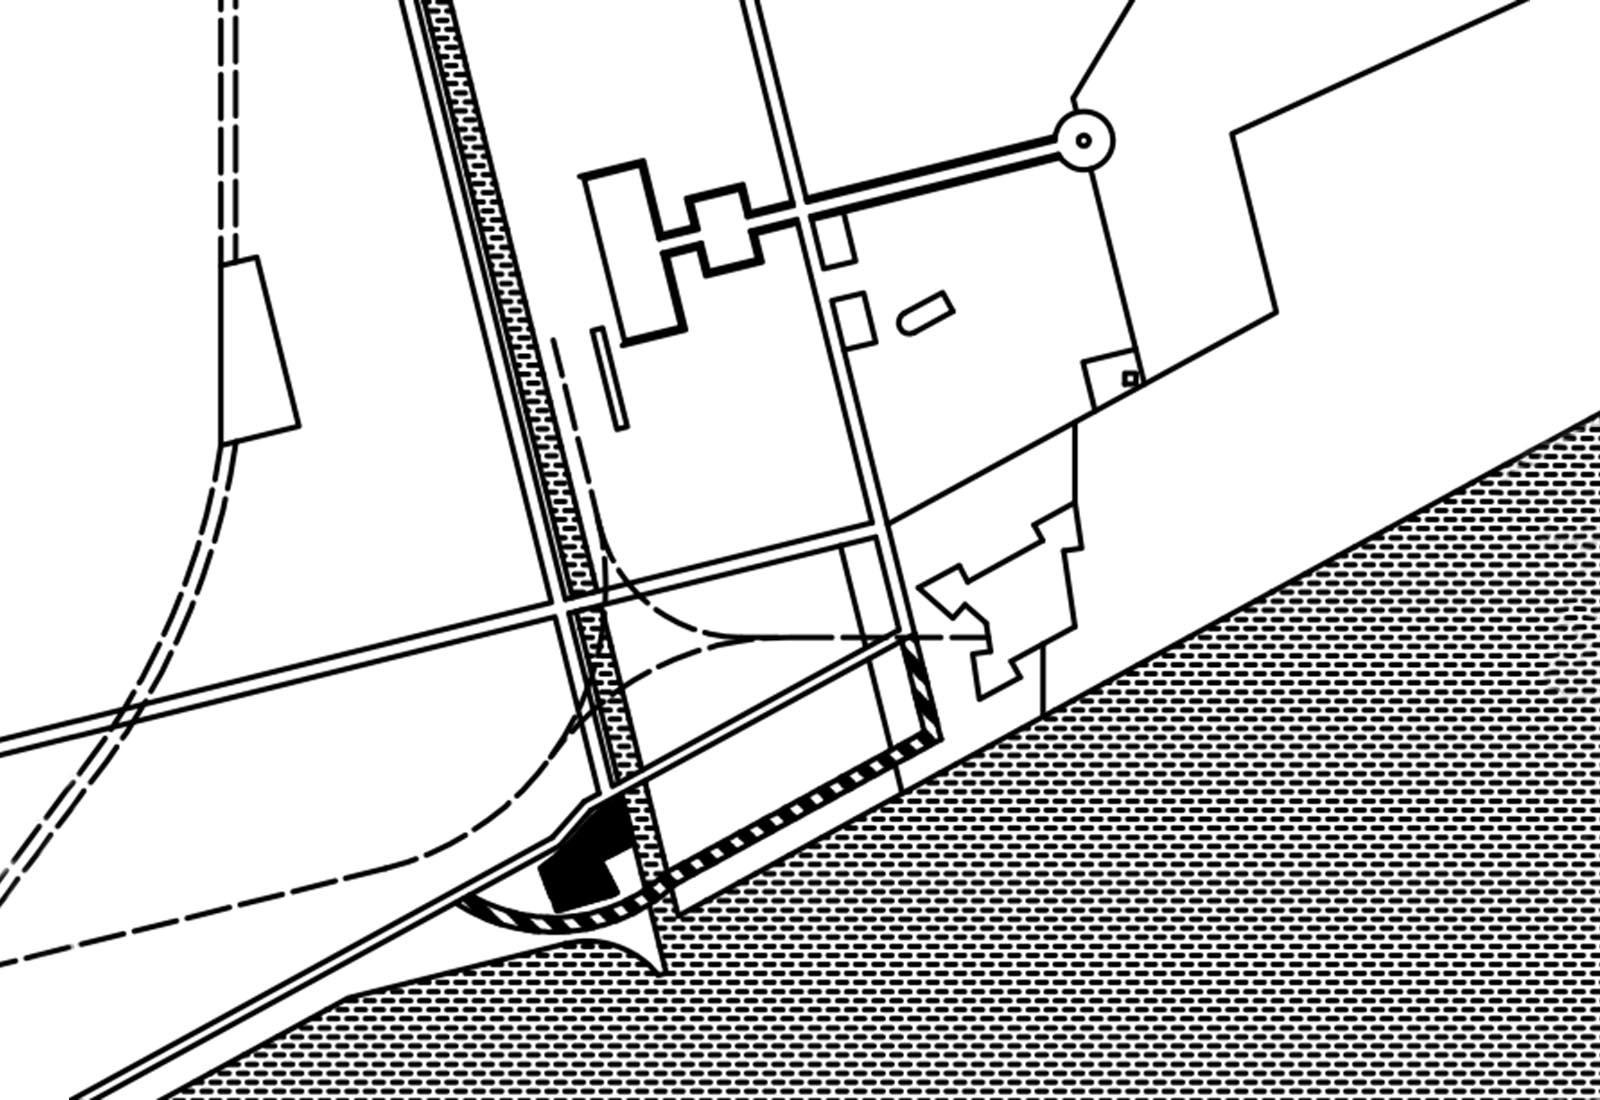 Paesaggi residenziali Savona - La ricucitura del tessuto urbano